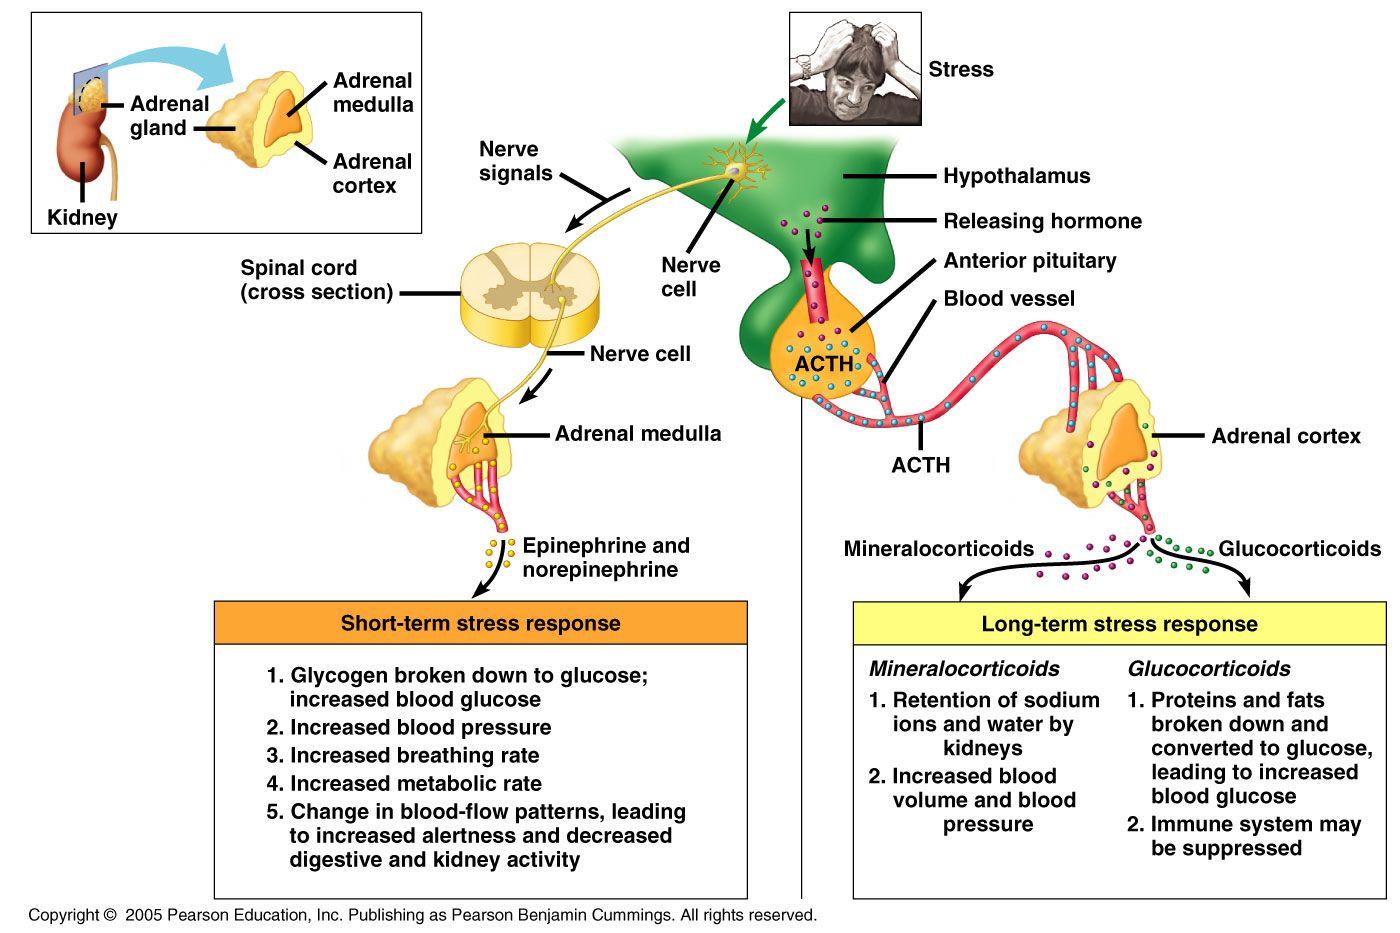 Adrenal Cortex Hormone Secretion